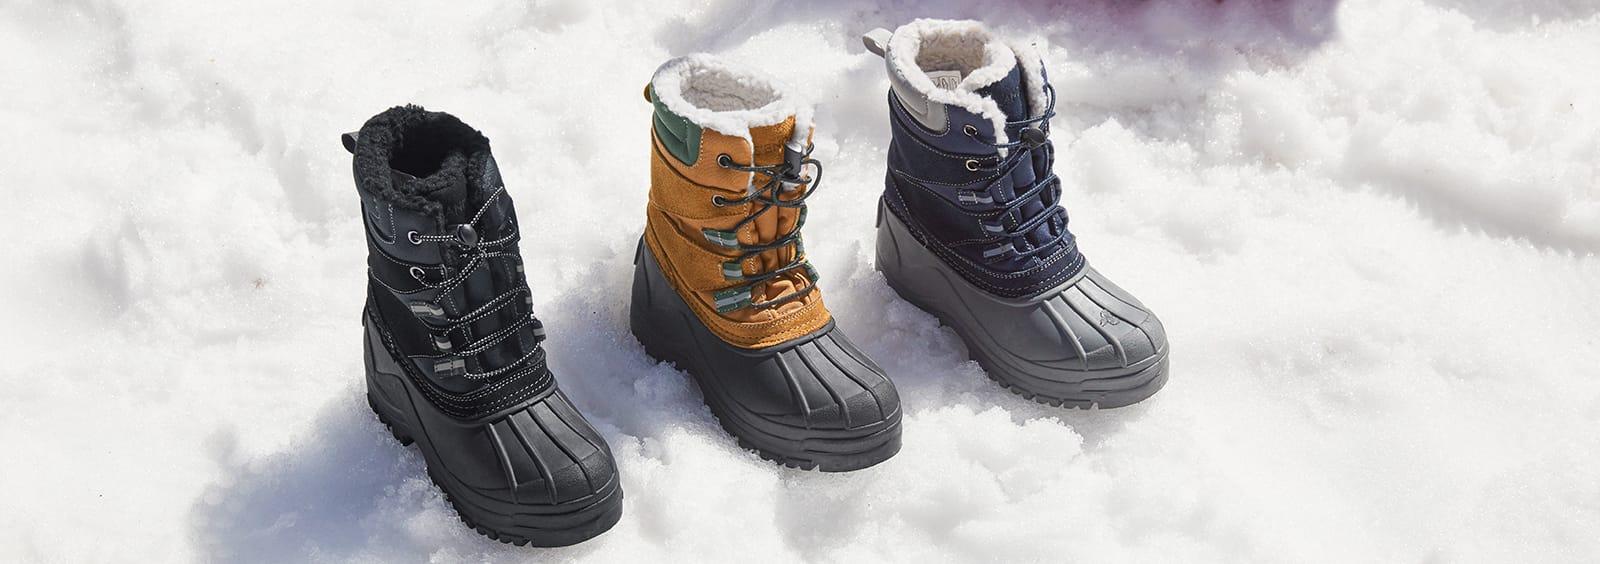 Best Boys' Snow Boots